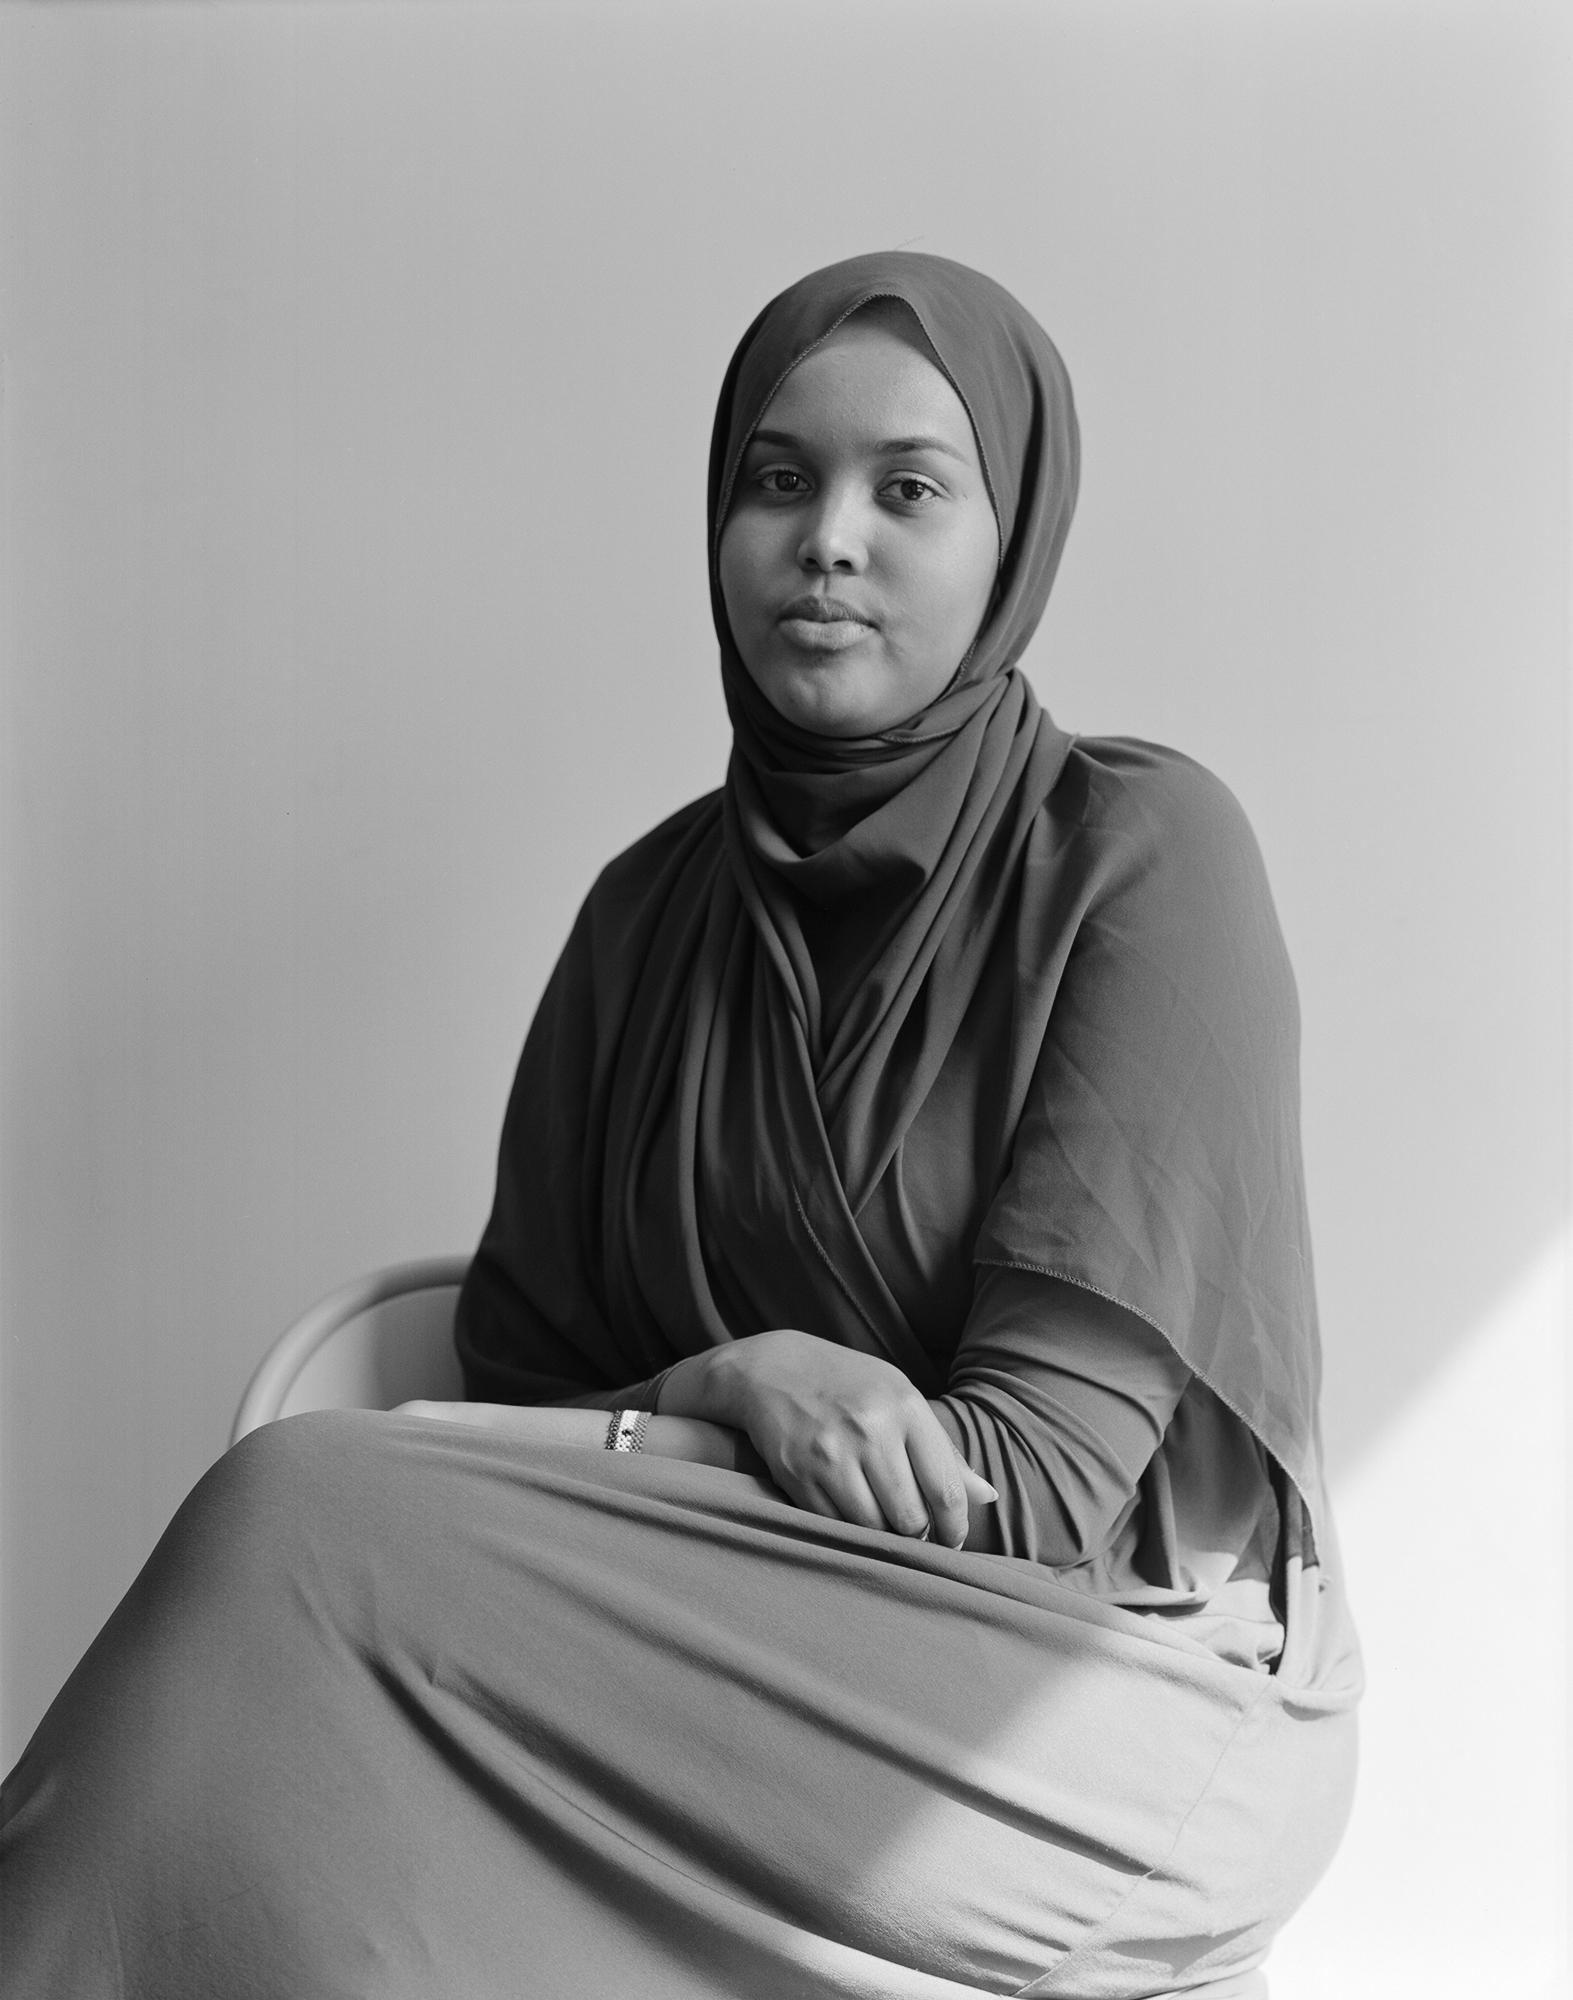 Hibo (Somalia) 2018